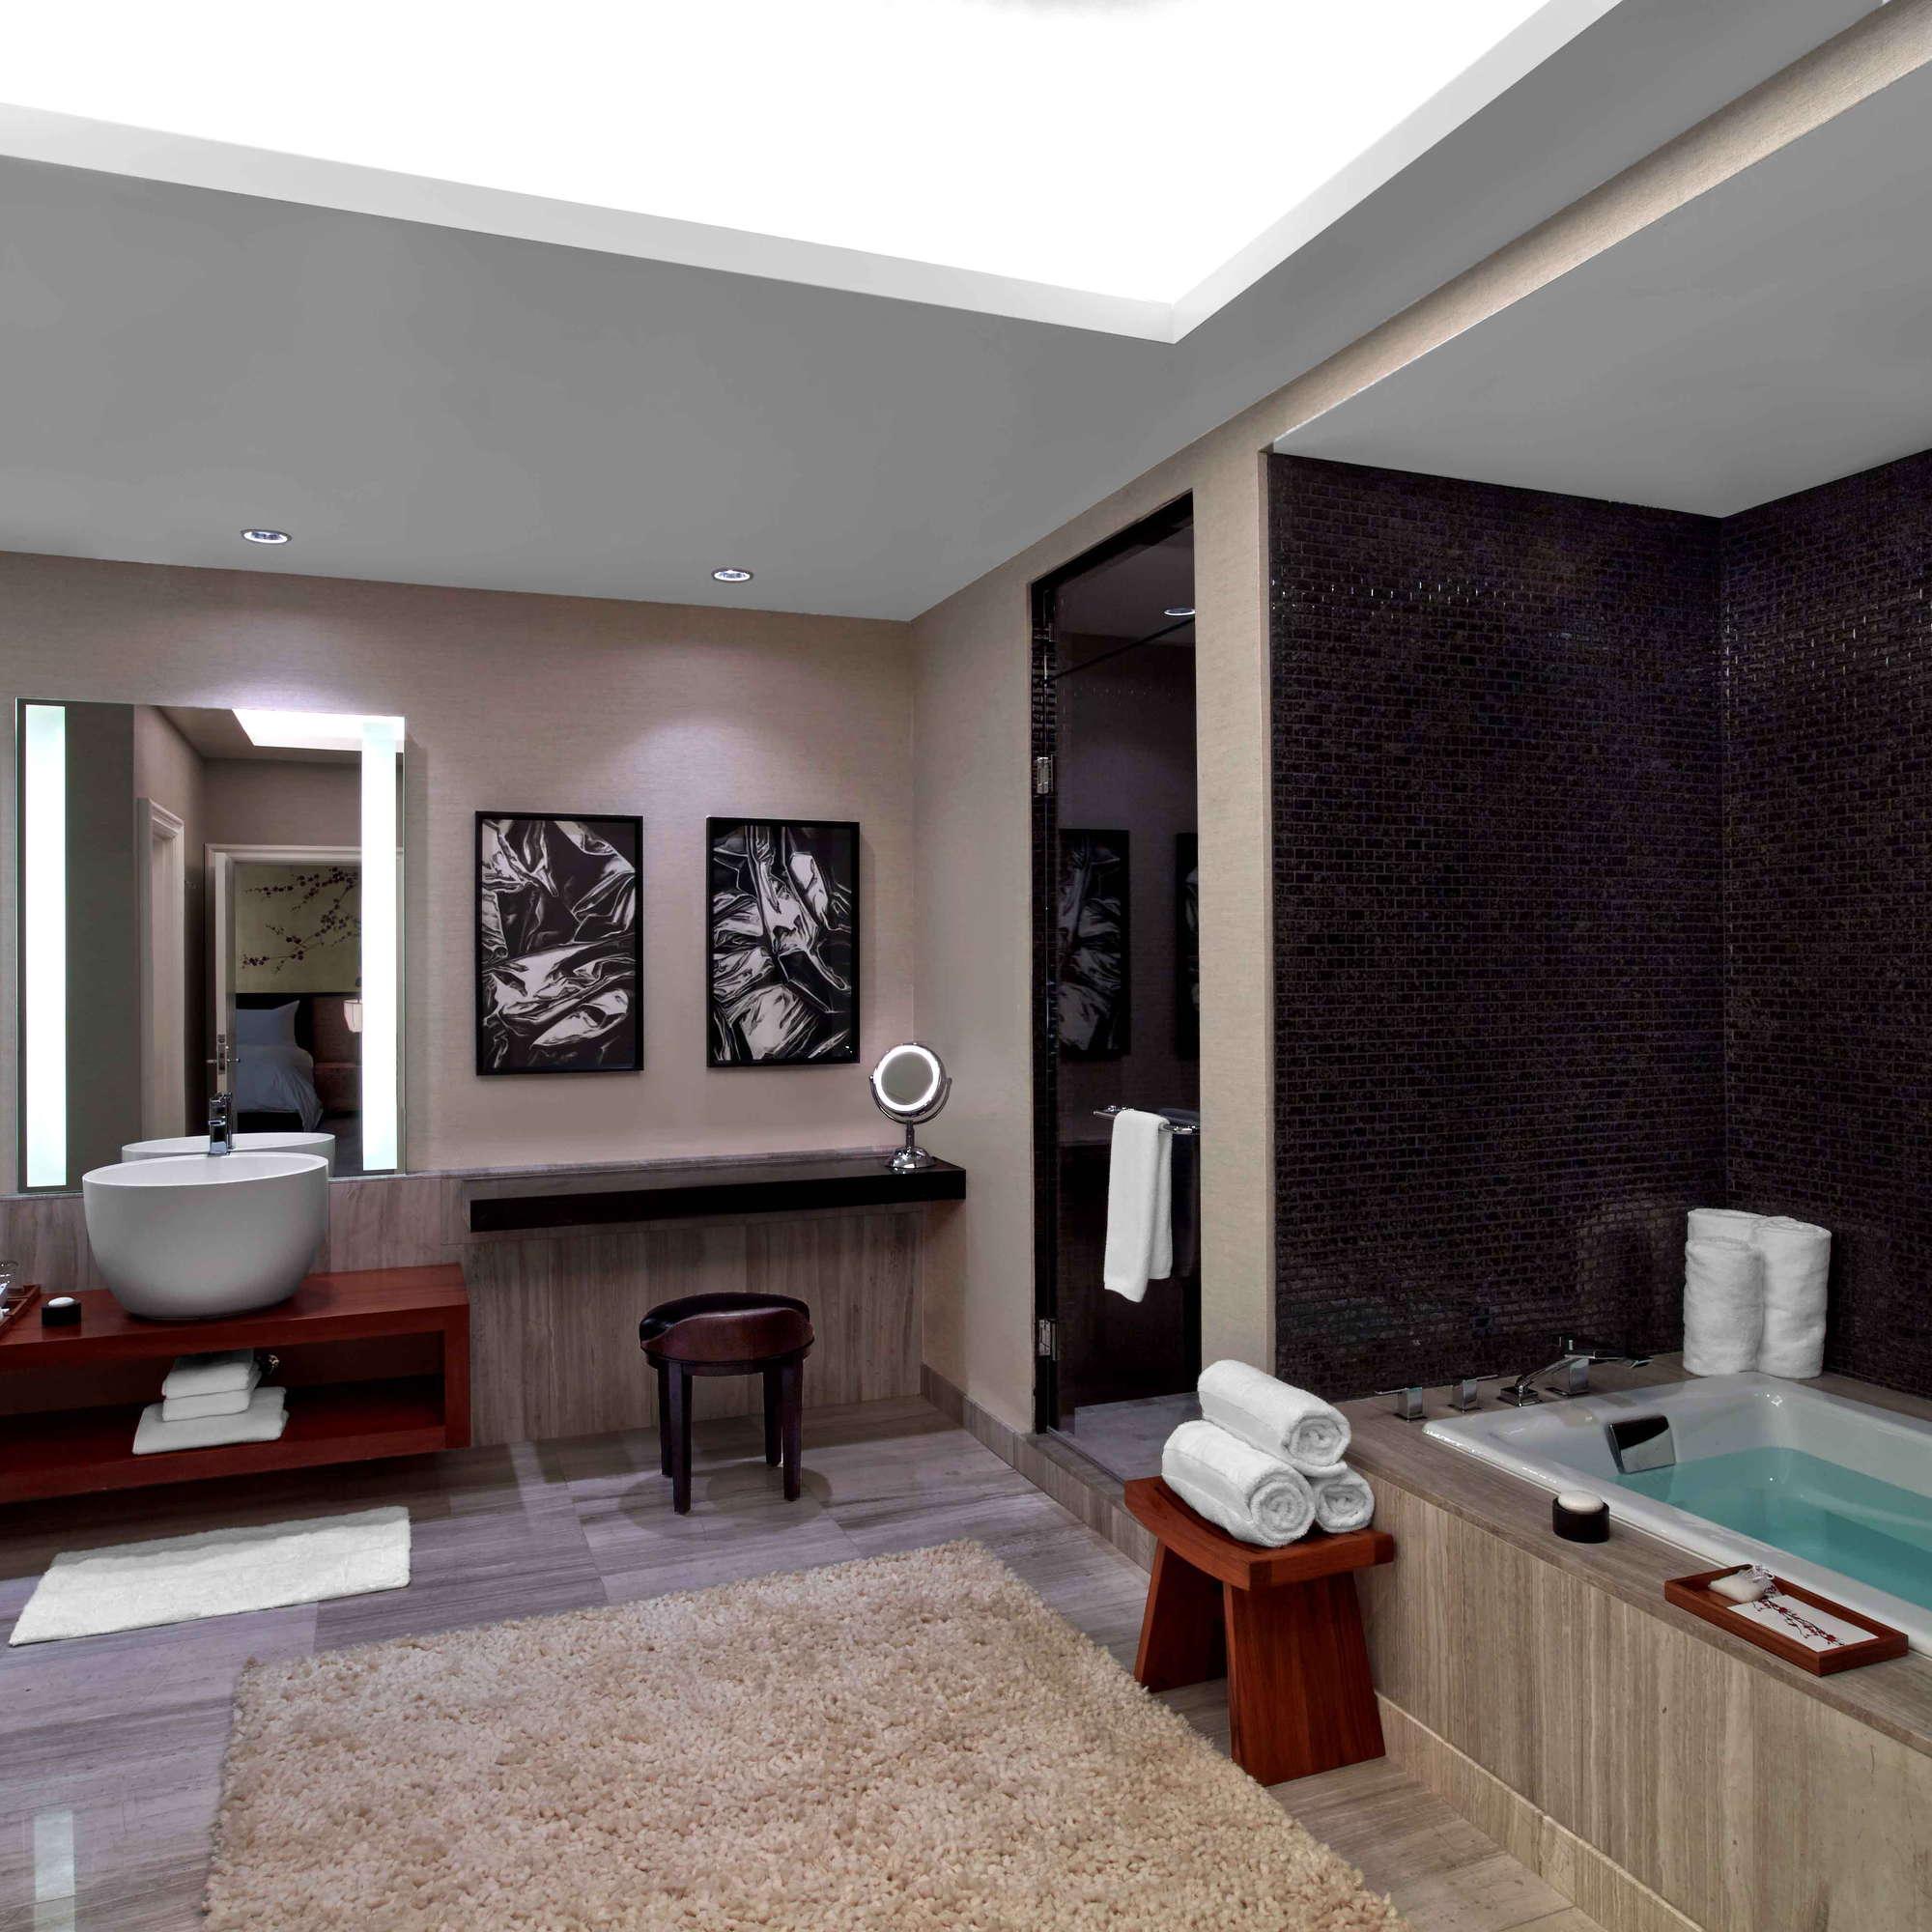 Nobu Hotel Expert Review Fodor S Travel